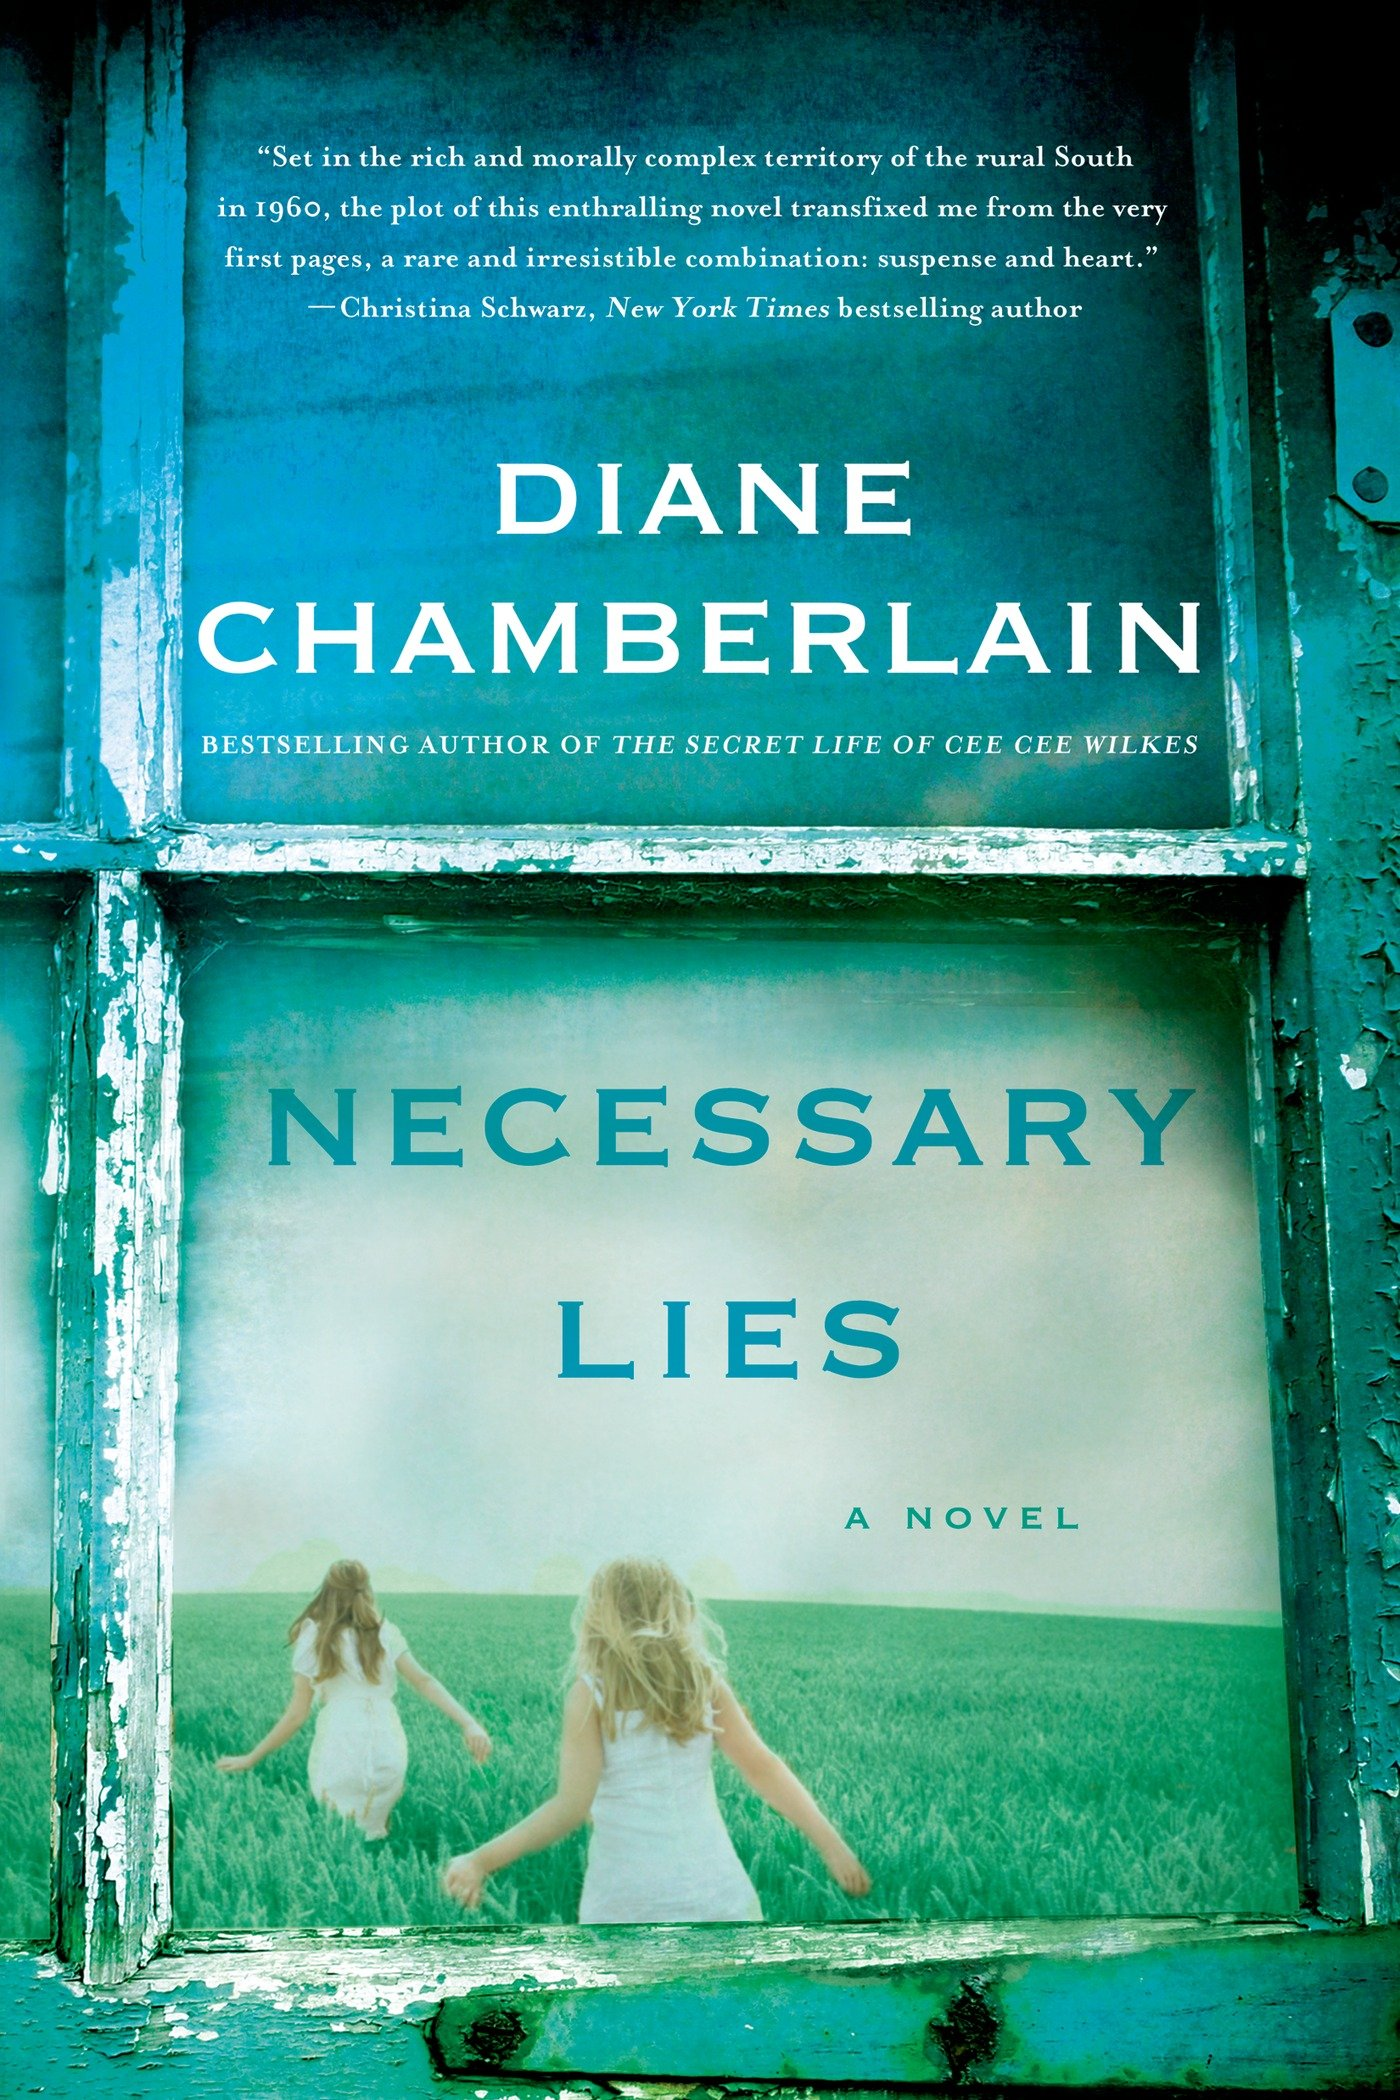 Necessary Lies Novel Diane Chamberlain product image